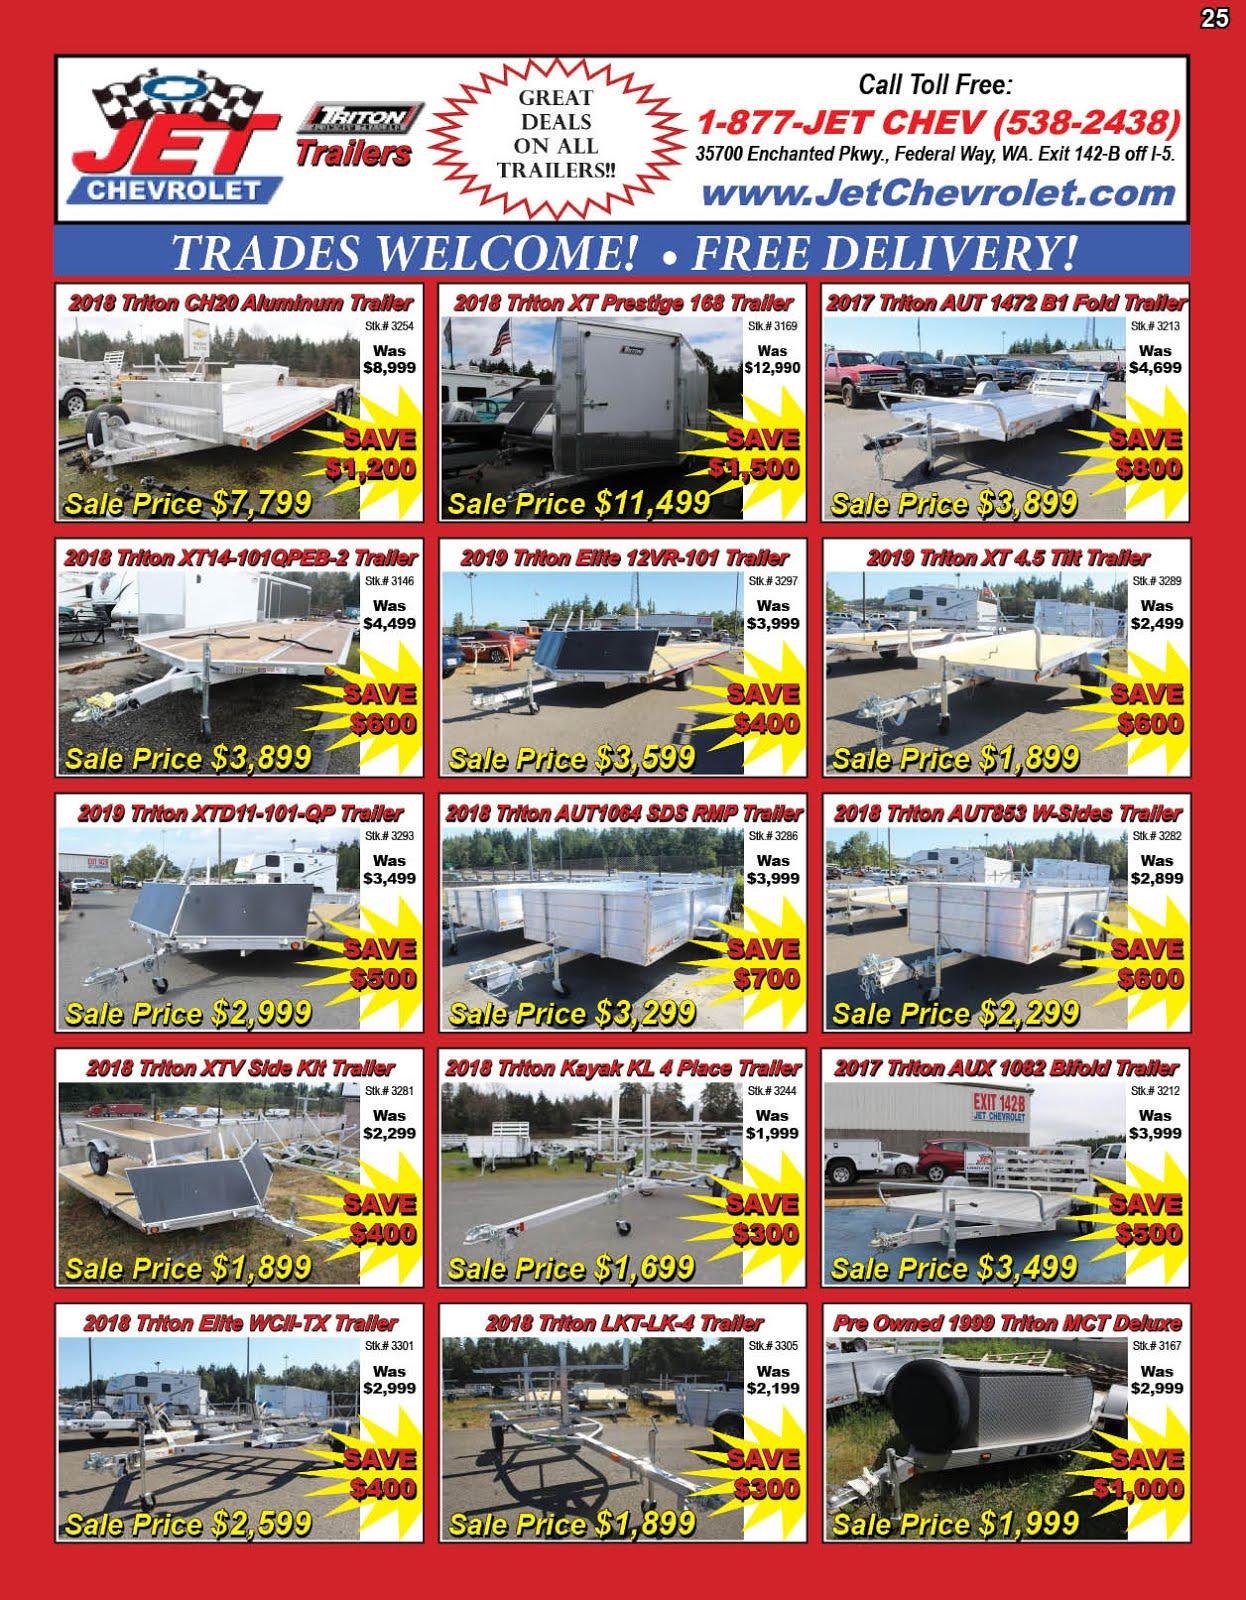 Jet Chevrolet Big Triton Trailers Sale!! Big Savings!!